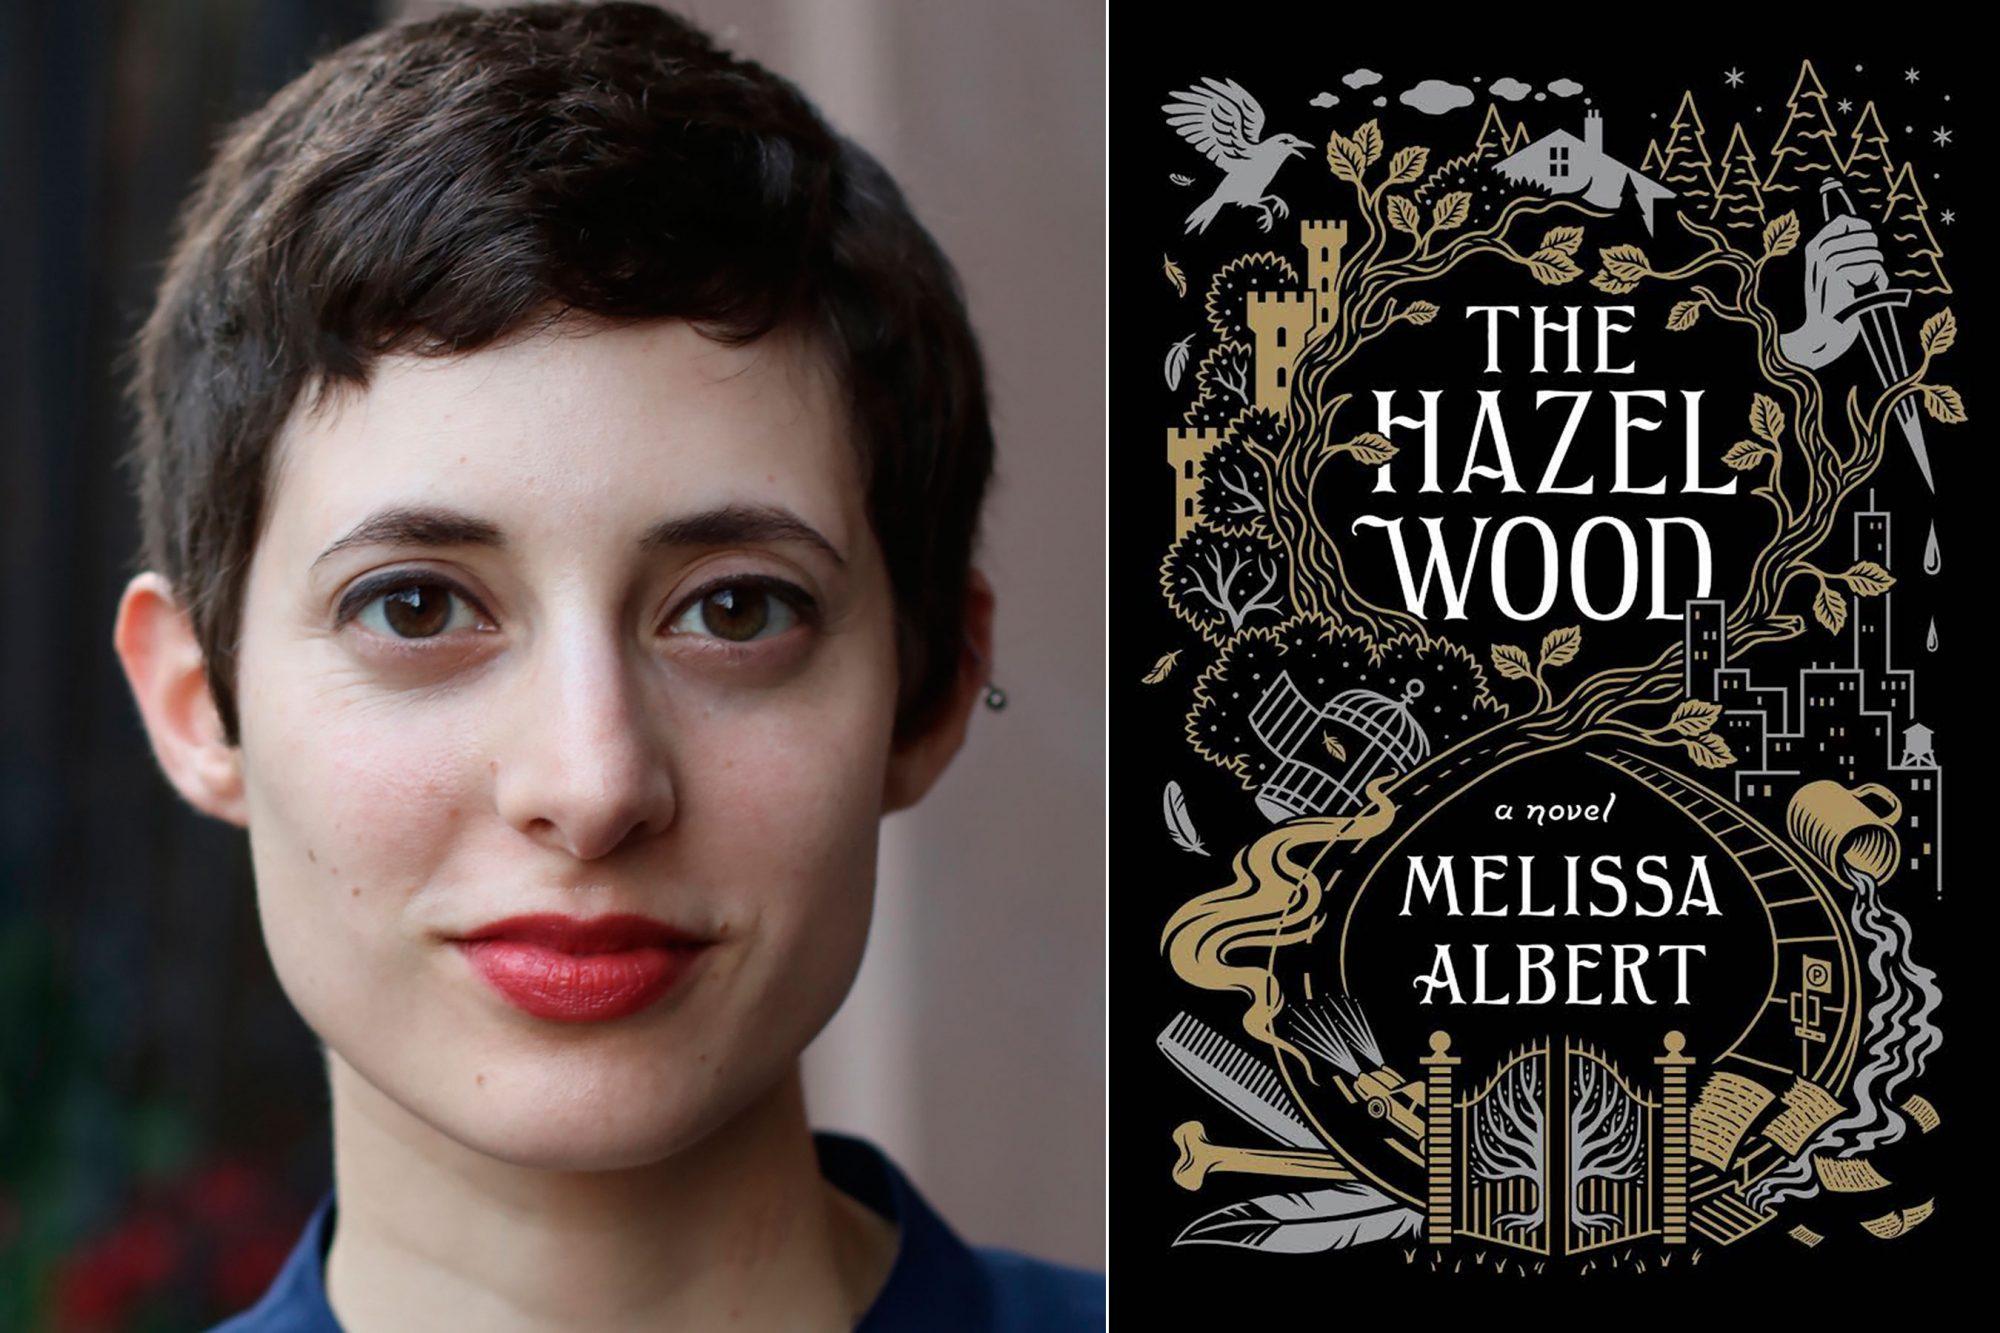 Melissa AlbertThe Hazel Wood